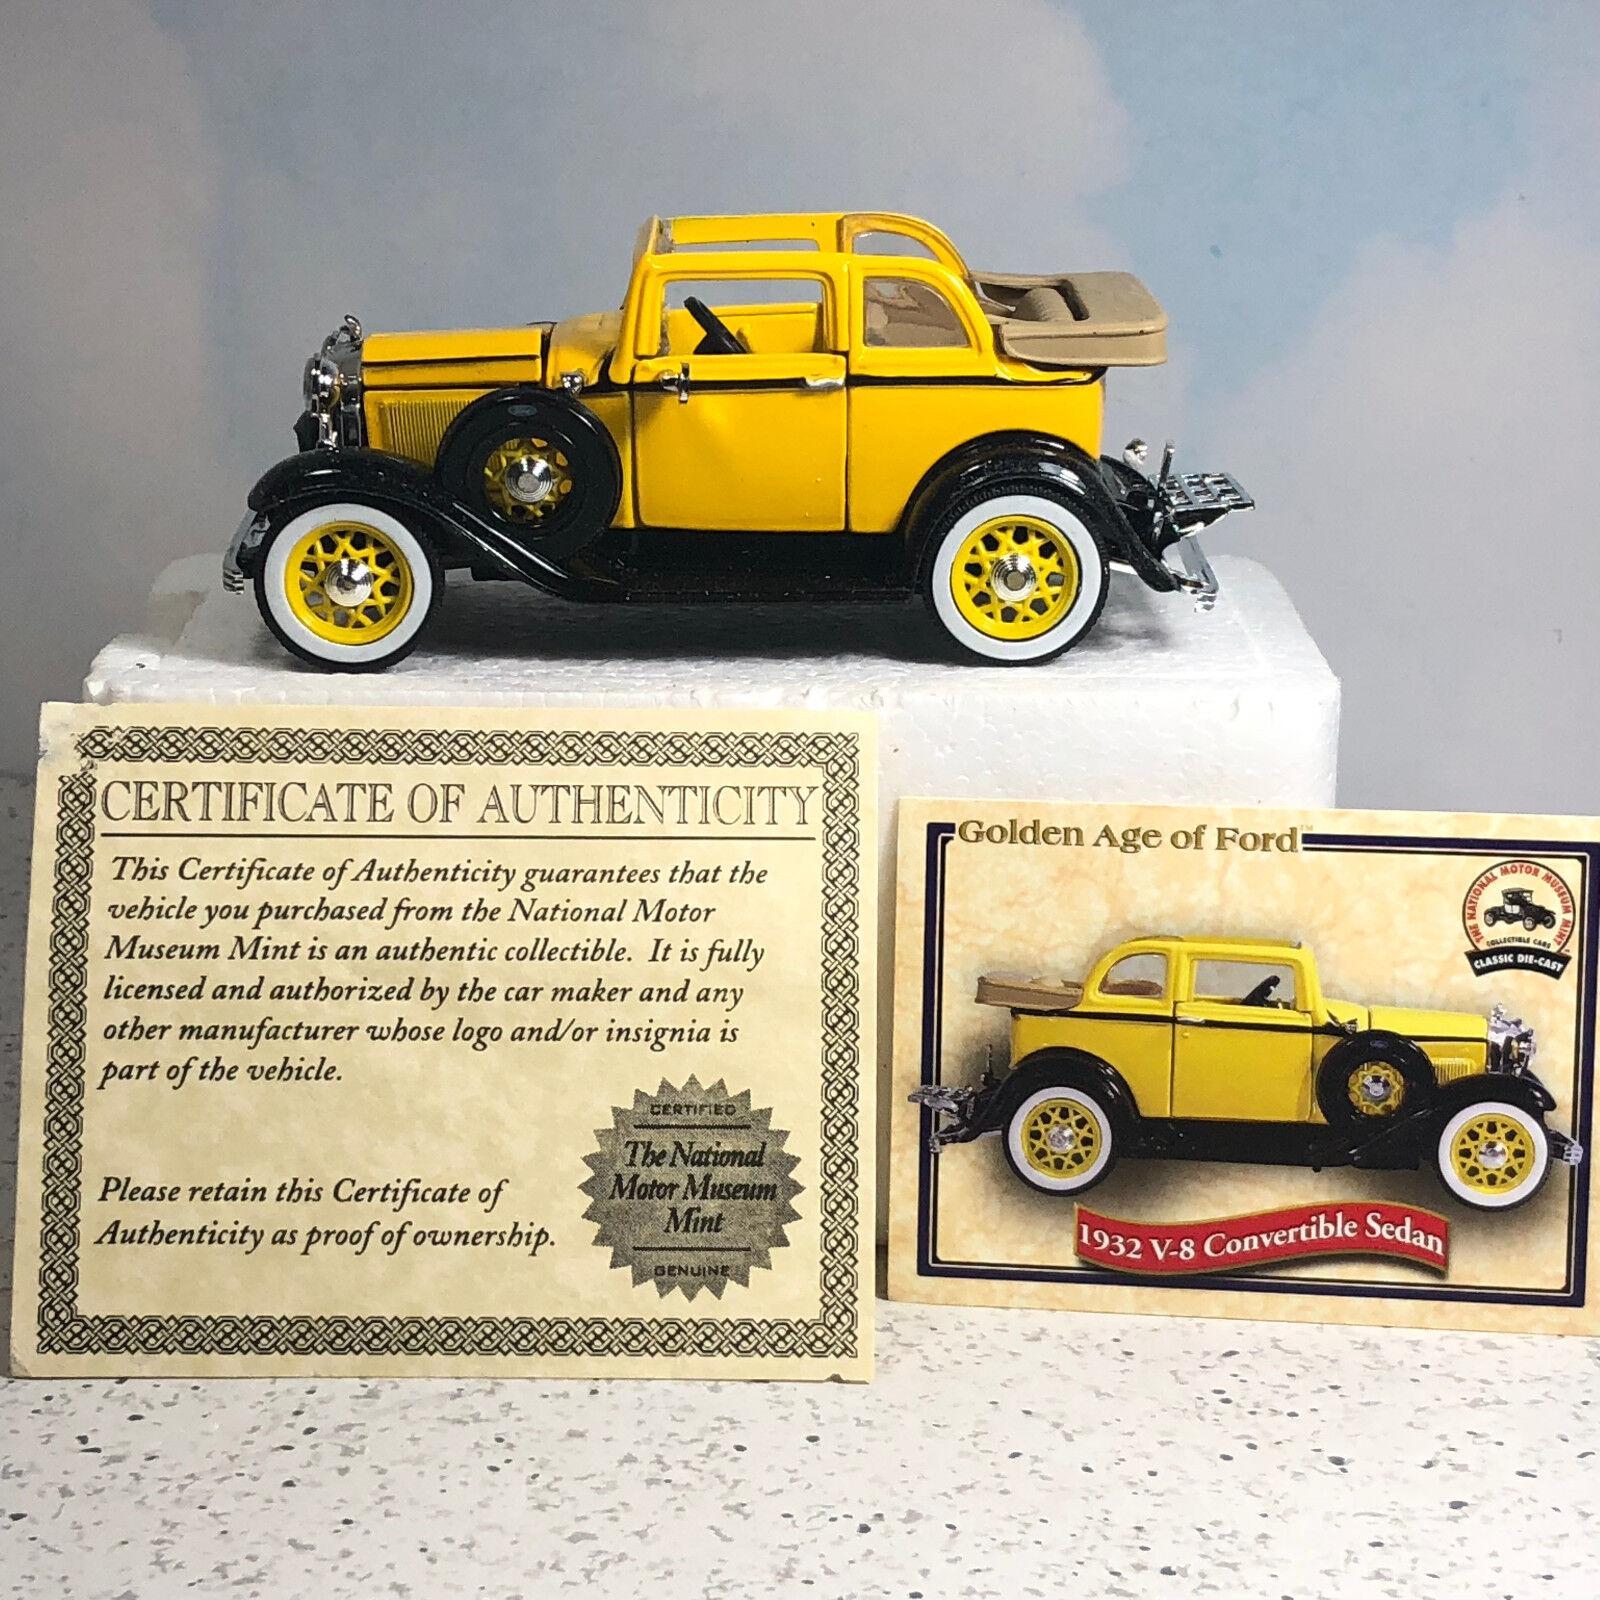 NATIONAL MOTOR MUSEUM MINT diecast model car 1932 ford ford ford V-8 congreenible sedan coa bb34de